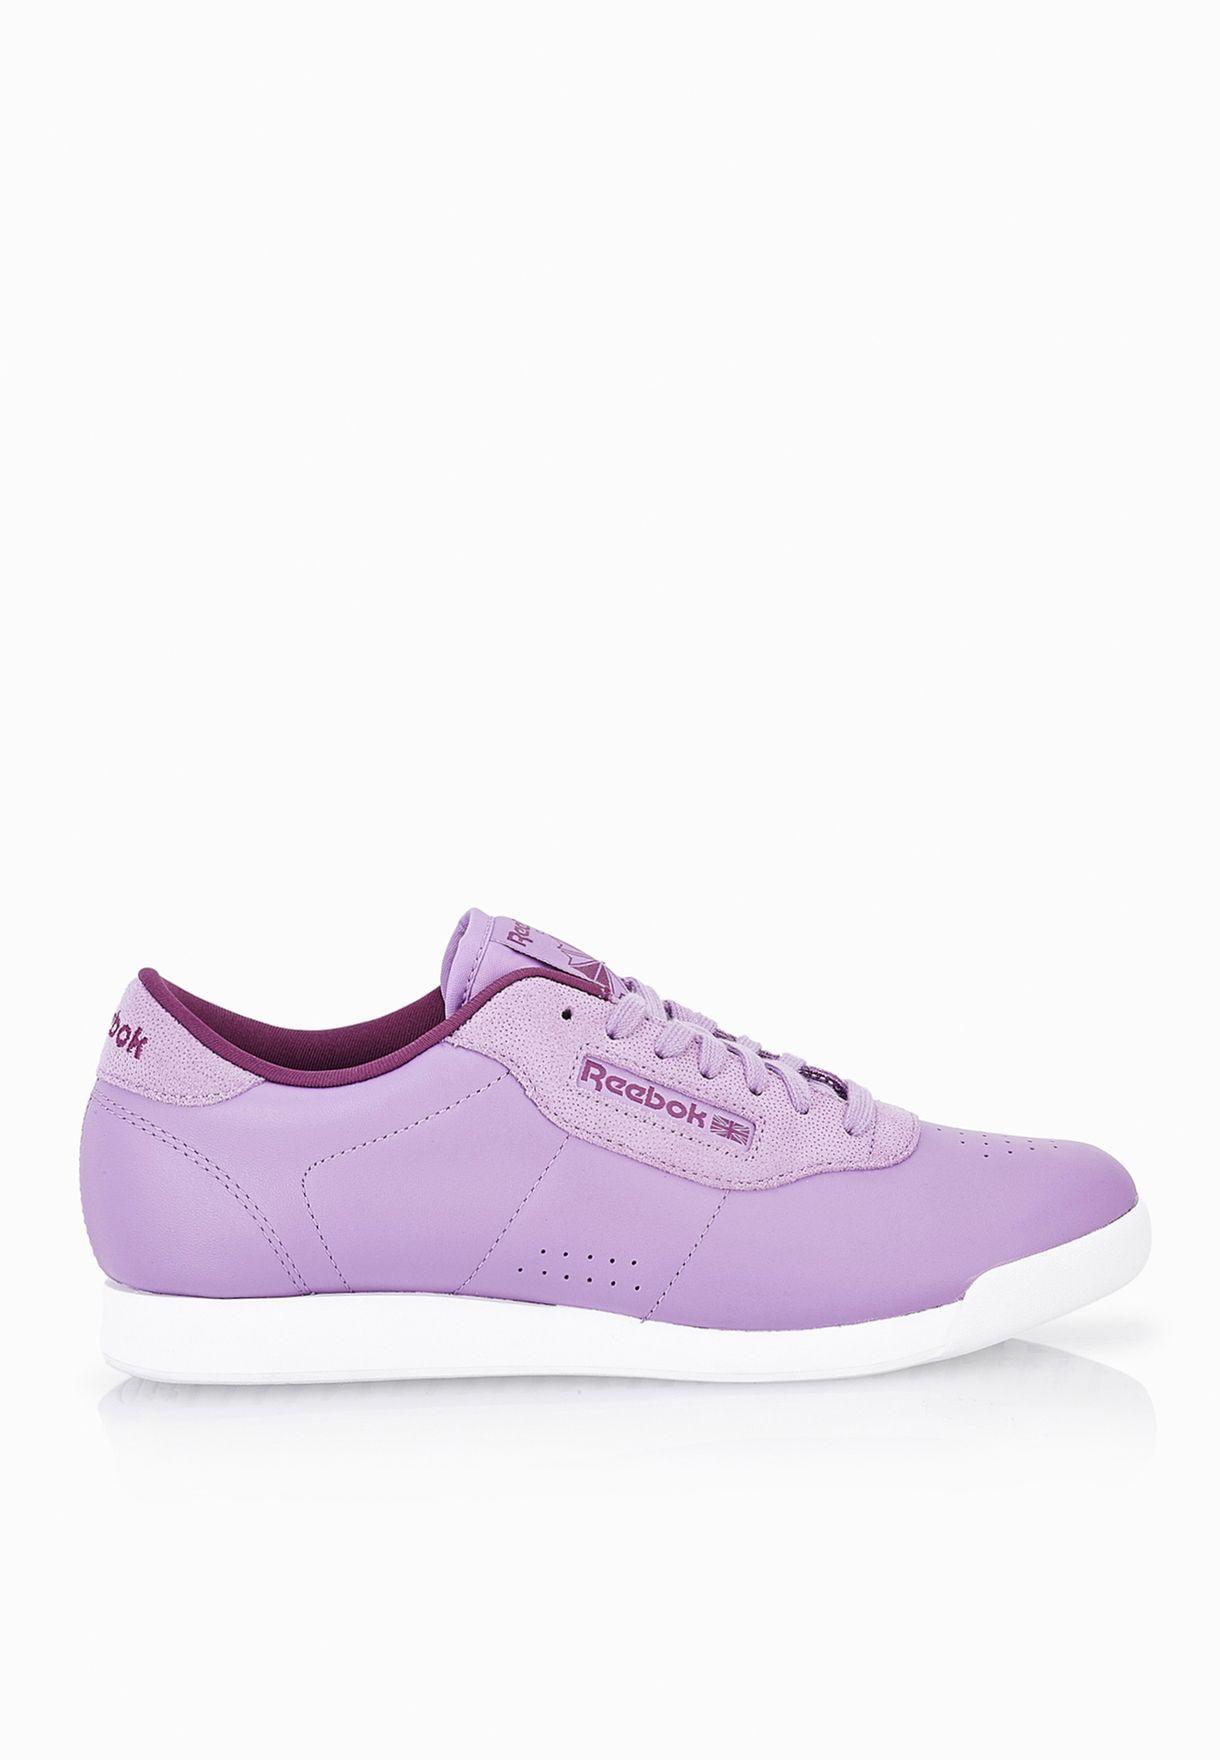 3d29656040f70 Shop Reebok purple Princess Candy Girl V69502 for Women in Oman ...